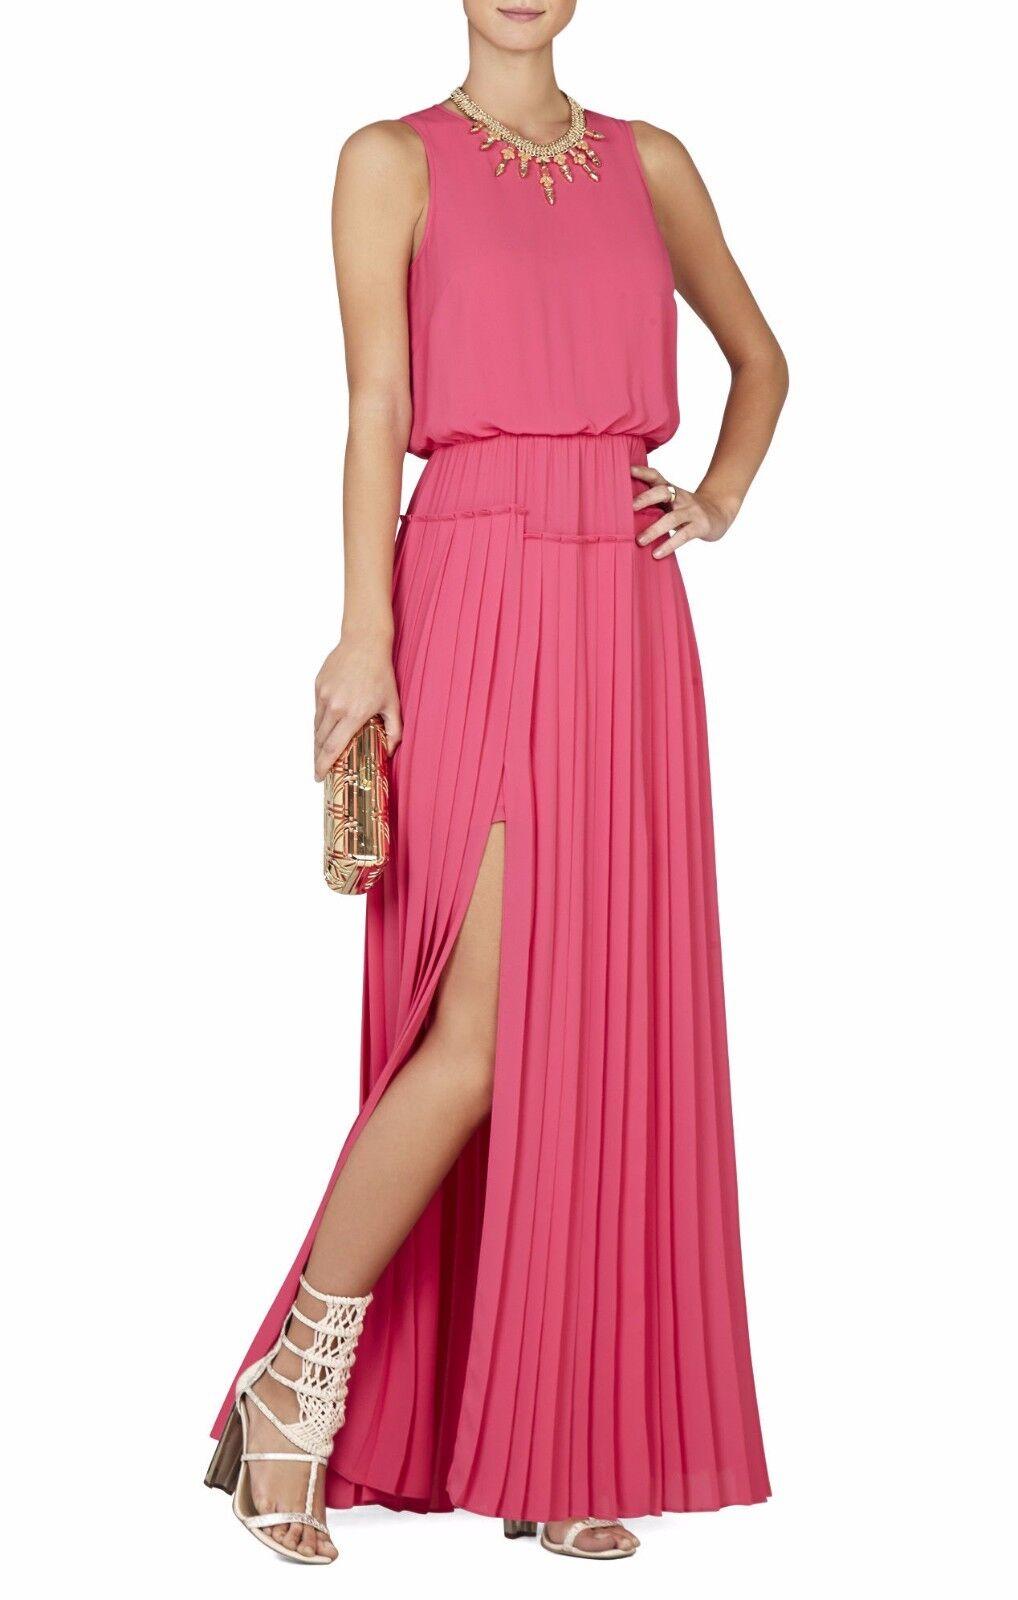 NWT BCBG JENINE HIGH-SLIT PLEATED SKIRT MAXI DRESS,Size XS